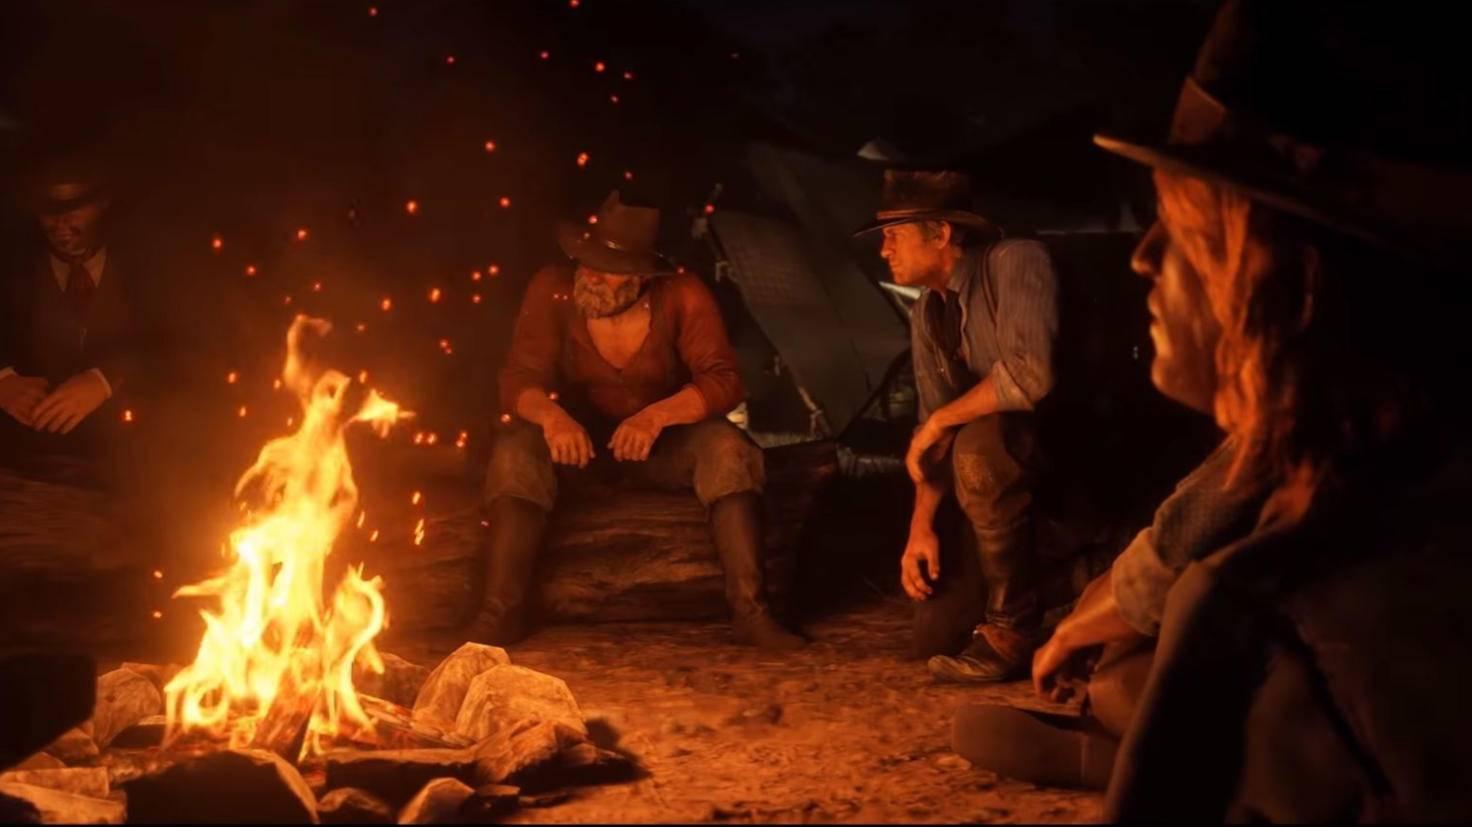 red-dead-redmption-uncle-screenshot